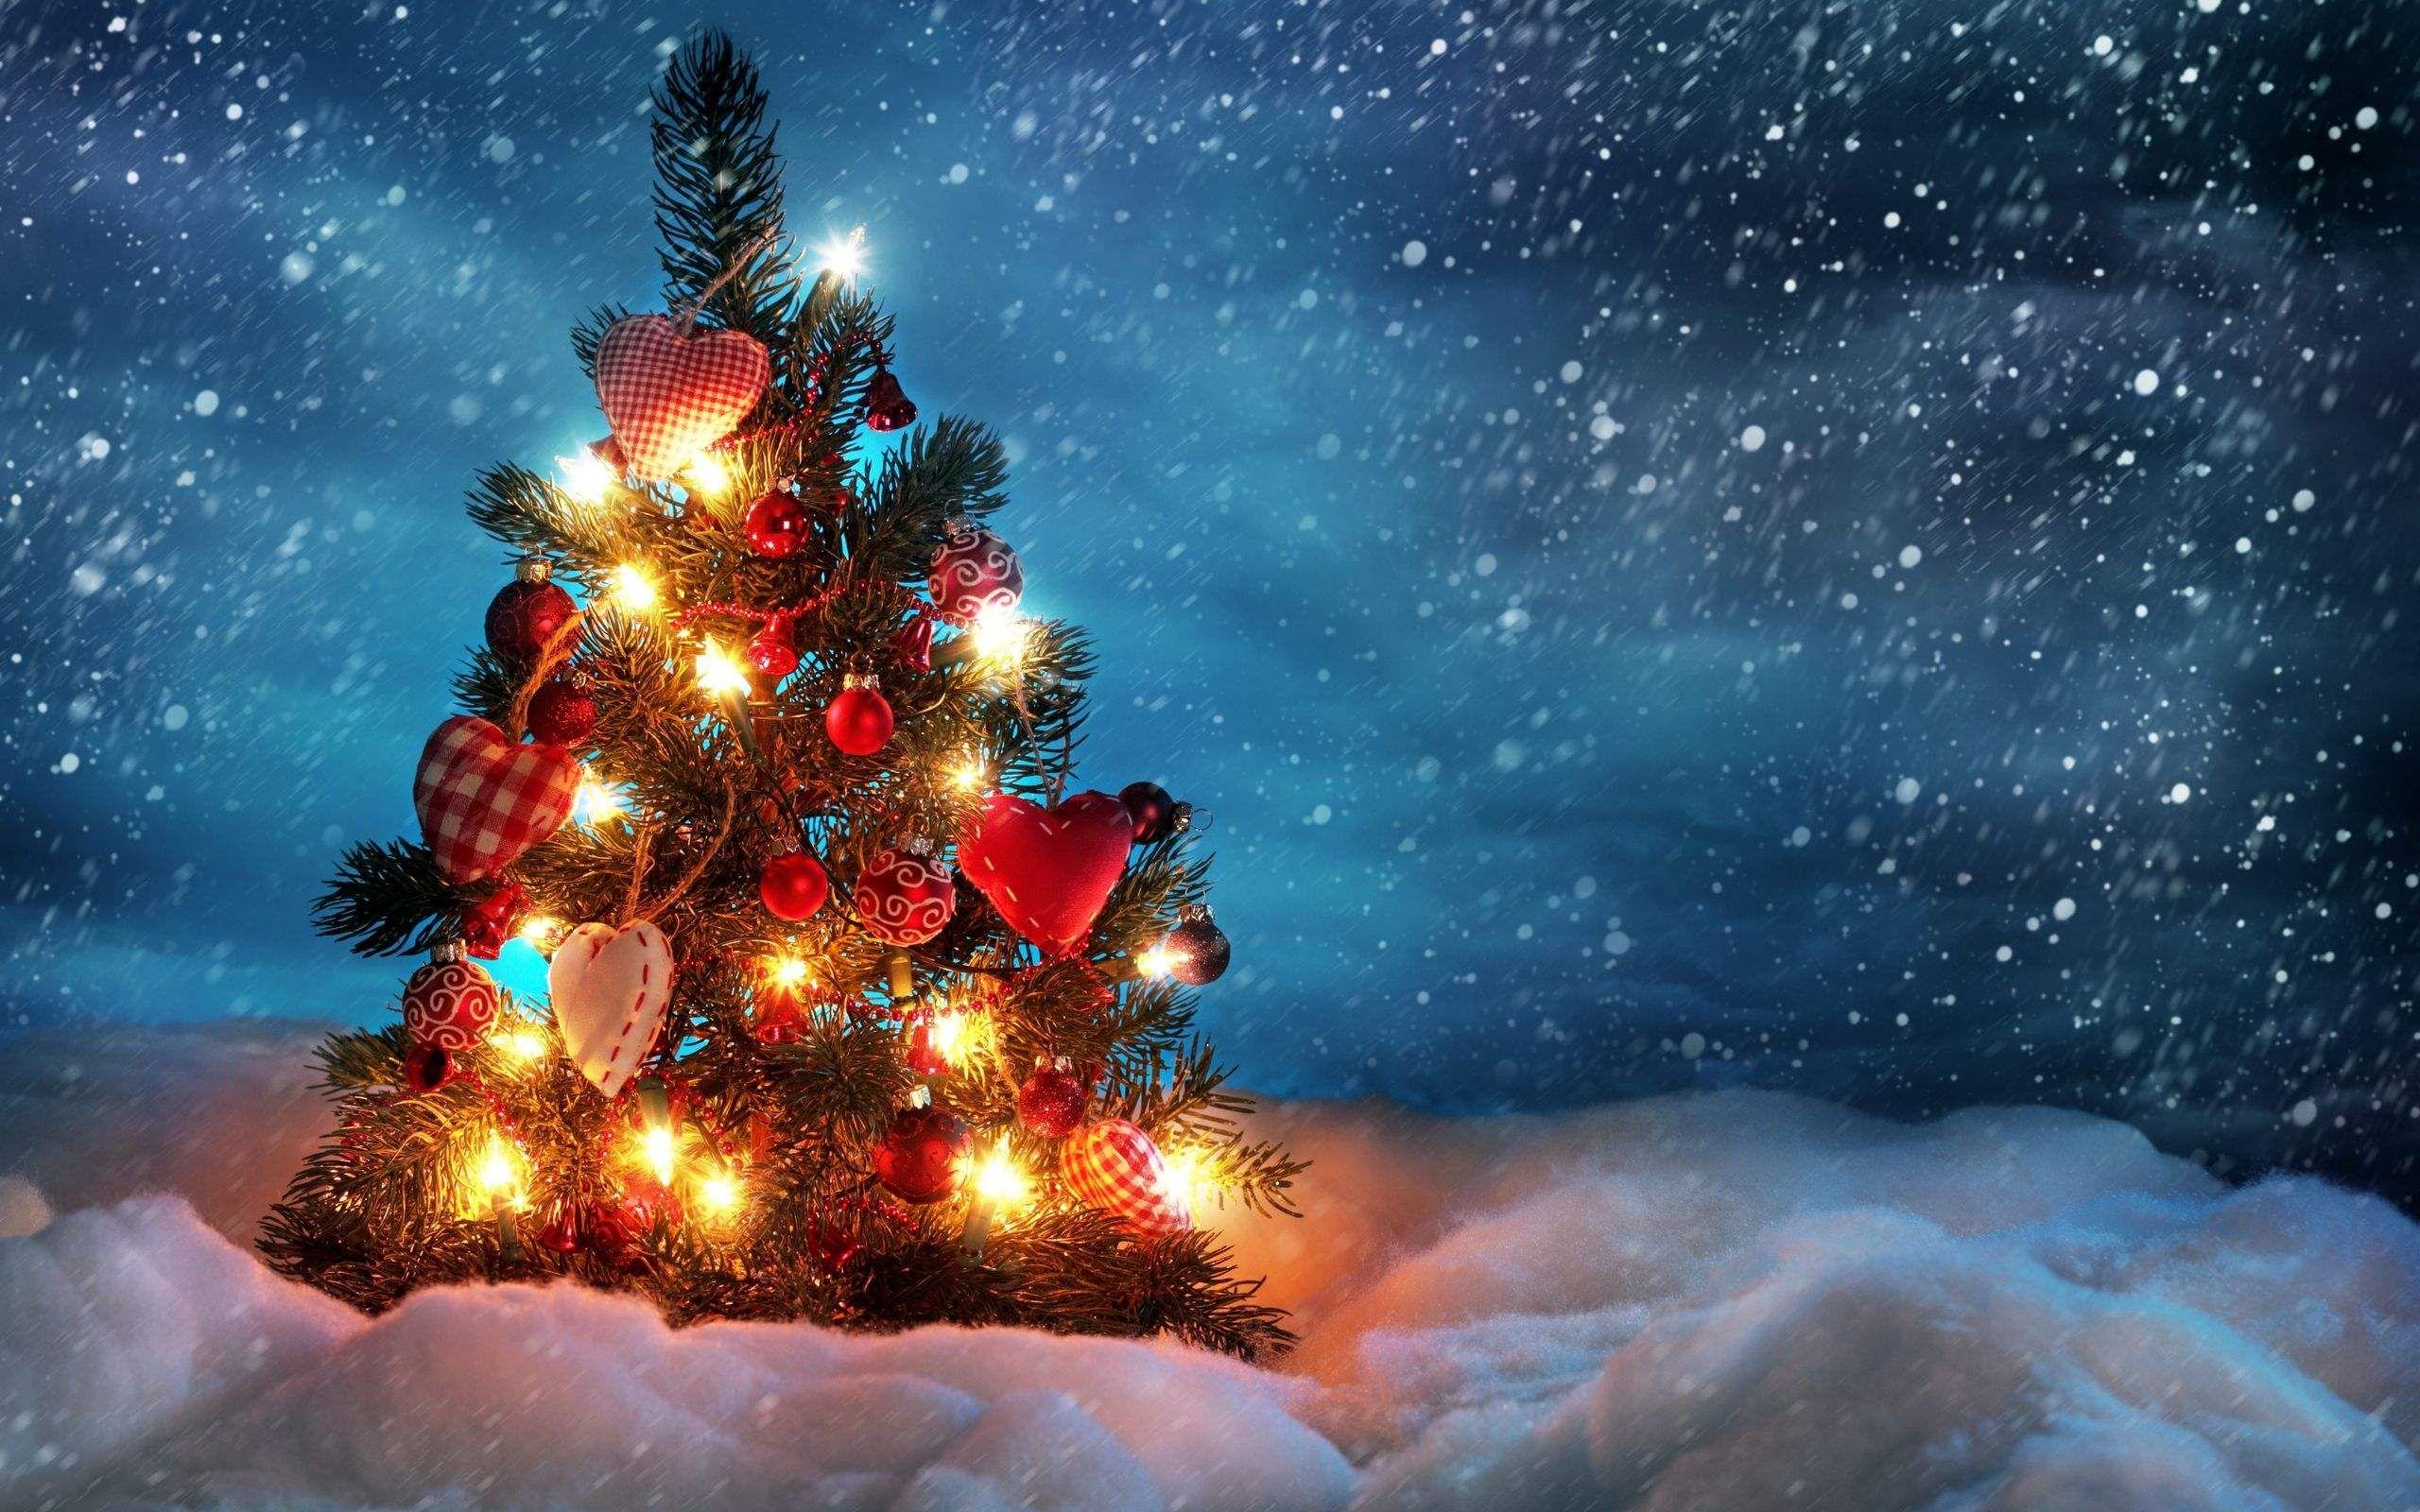 Merry Christmas Christmas Desktop Christmas Desktop Wallpaper Christmas Tree Wallpaper